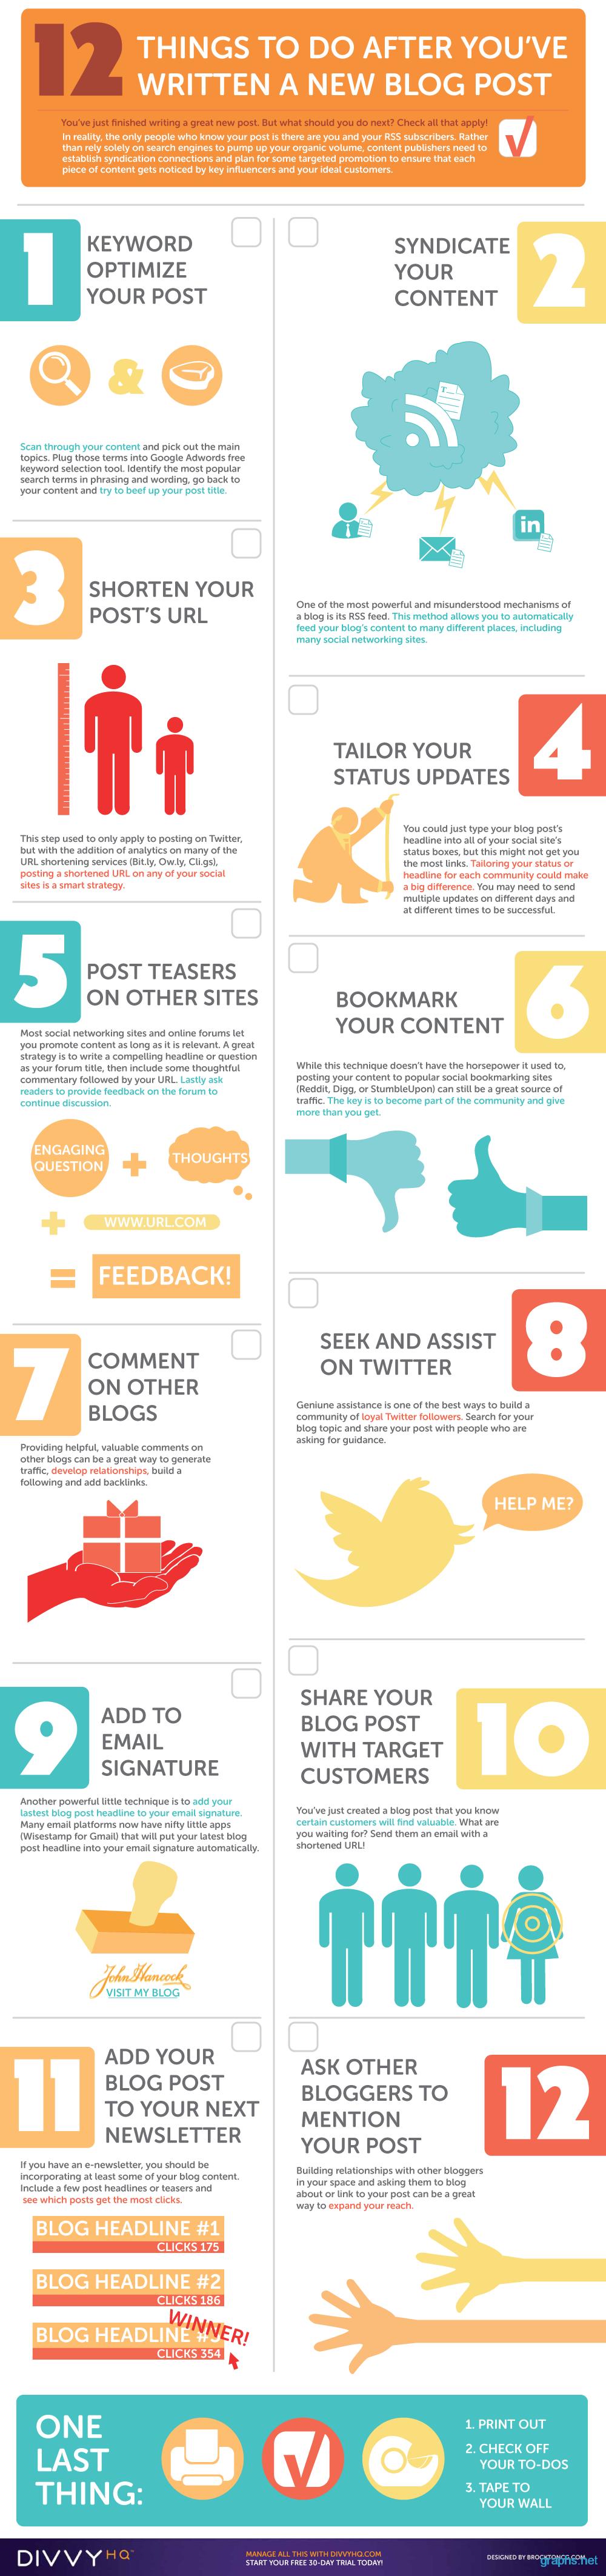 Effective blog post tips